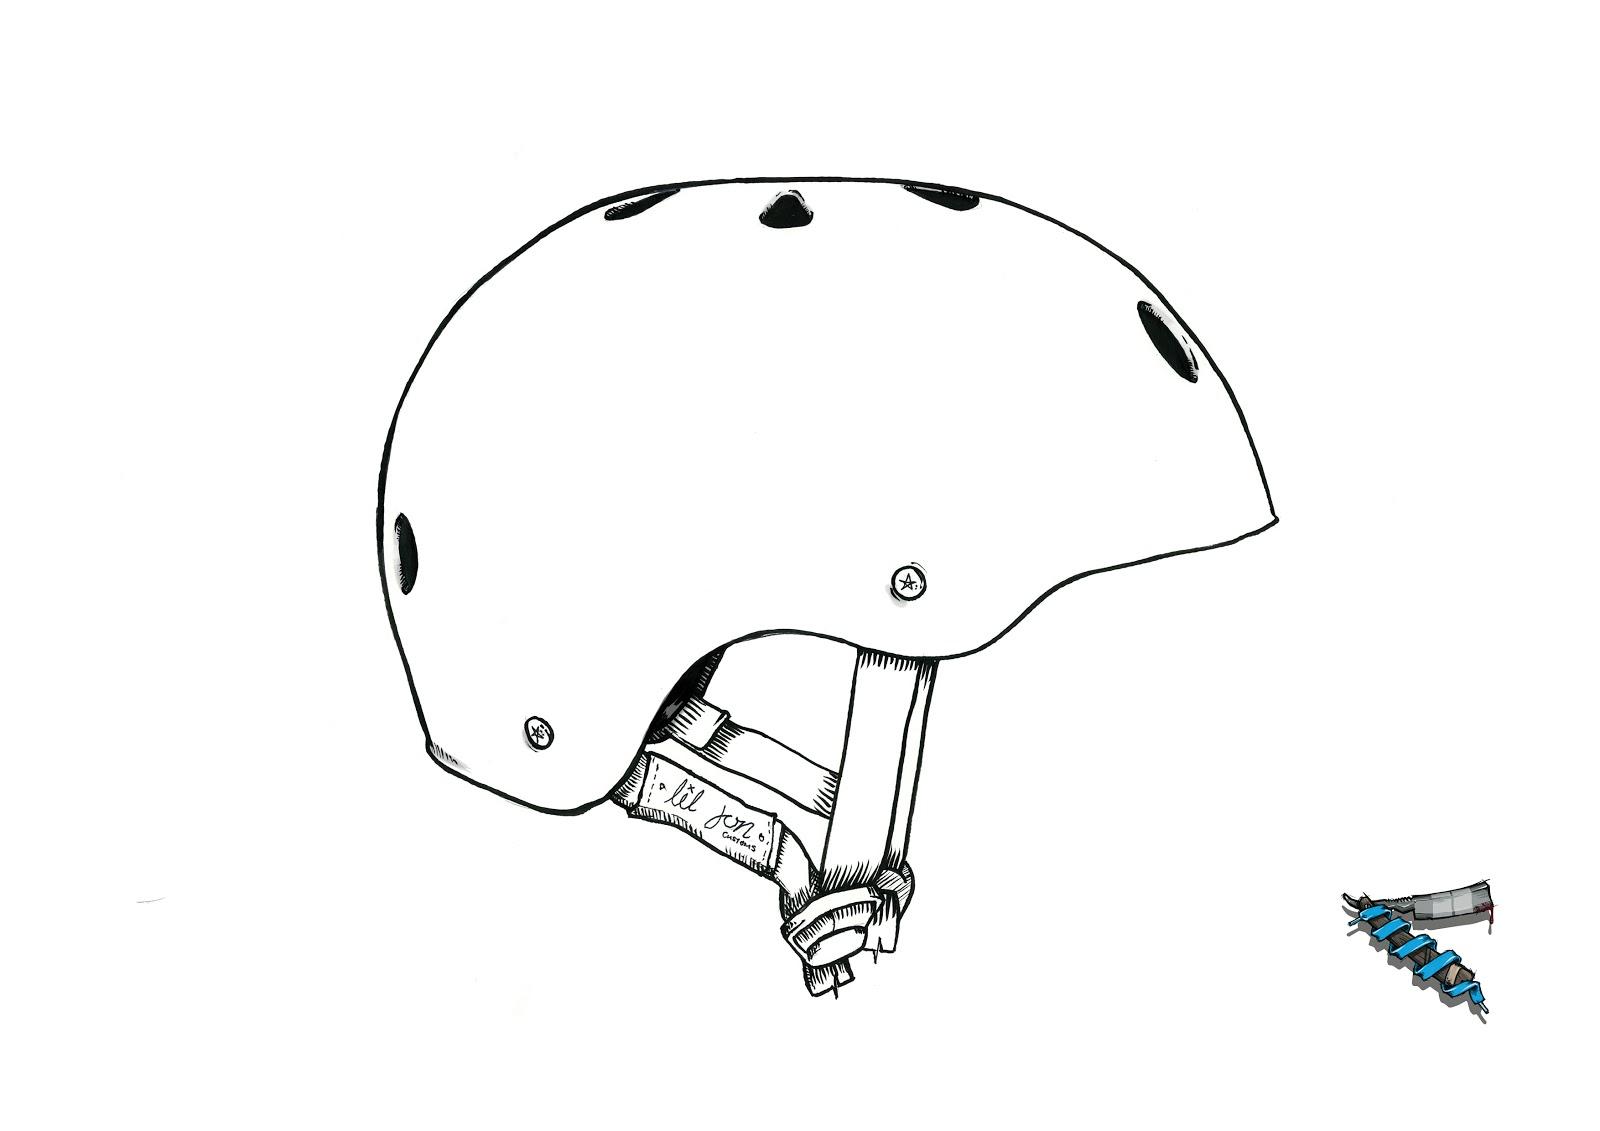 Helmet Design Template : Free Programs, Utilities and Apps ...